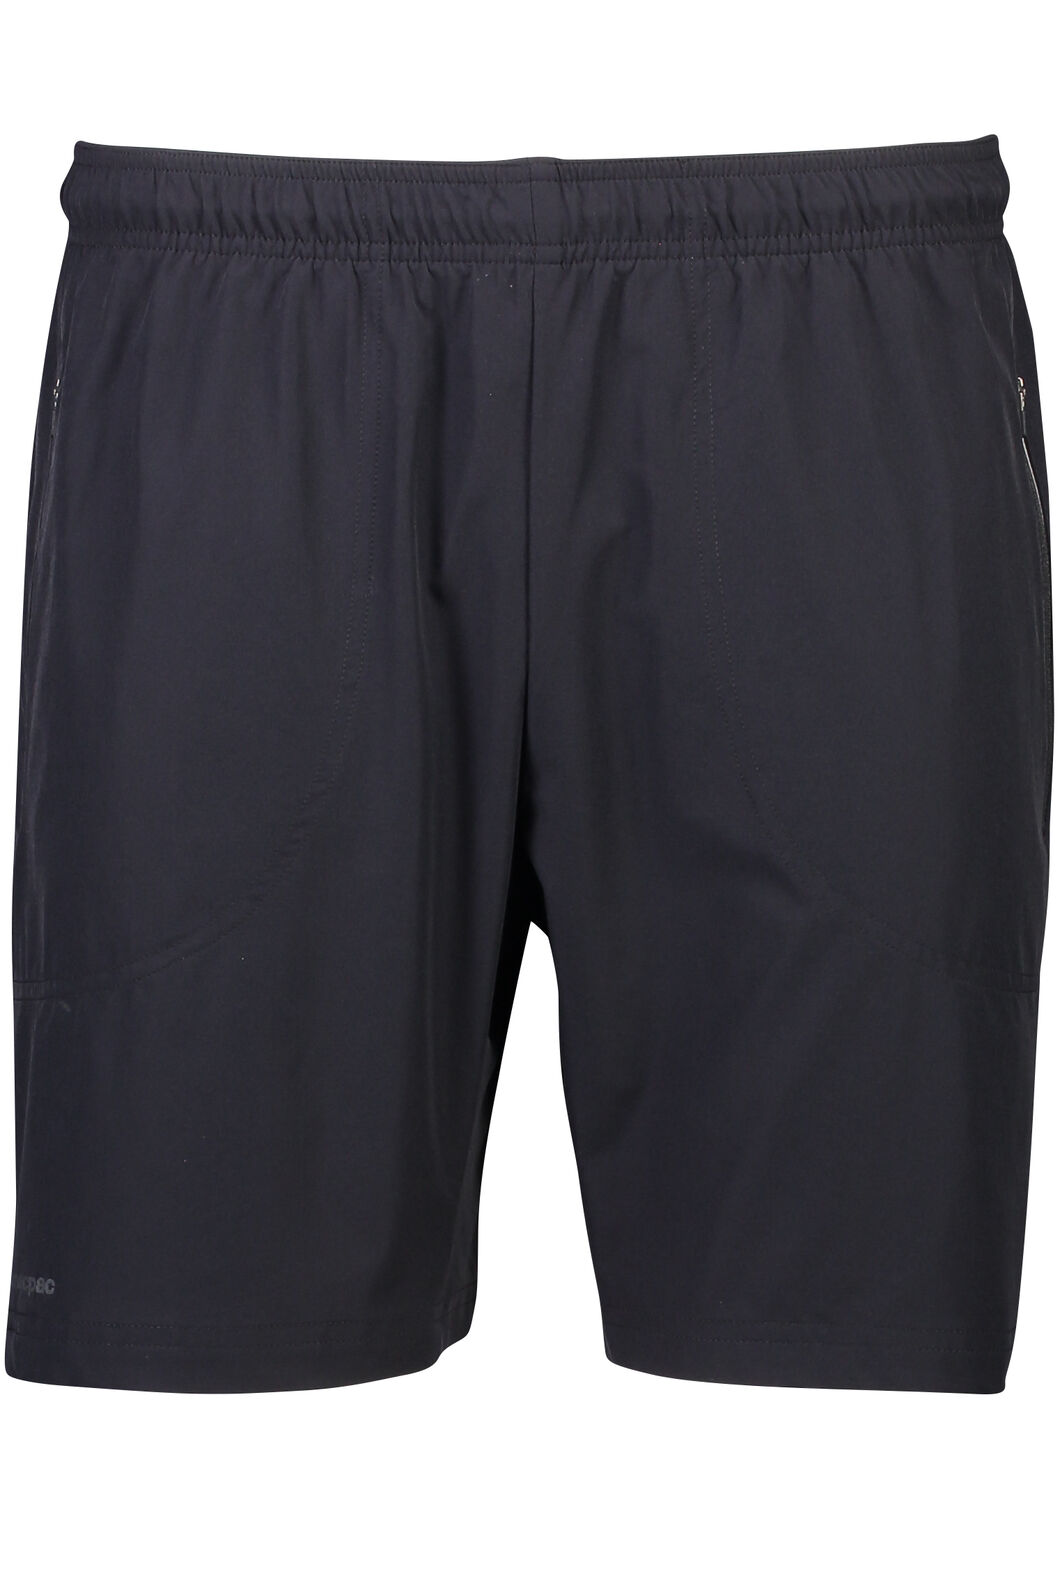 Macpac Fast Track Shorts - Men's, Black, hi-res